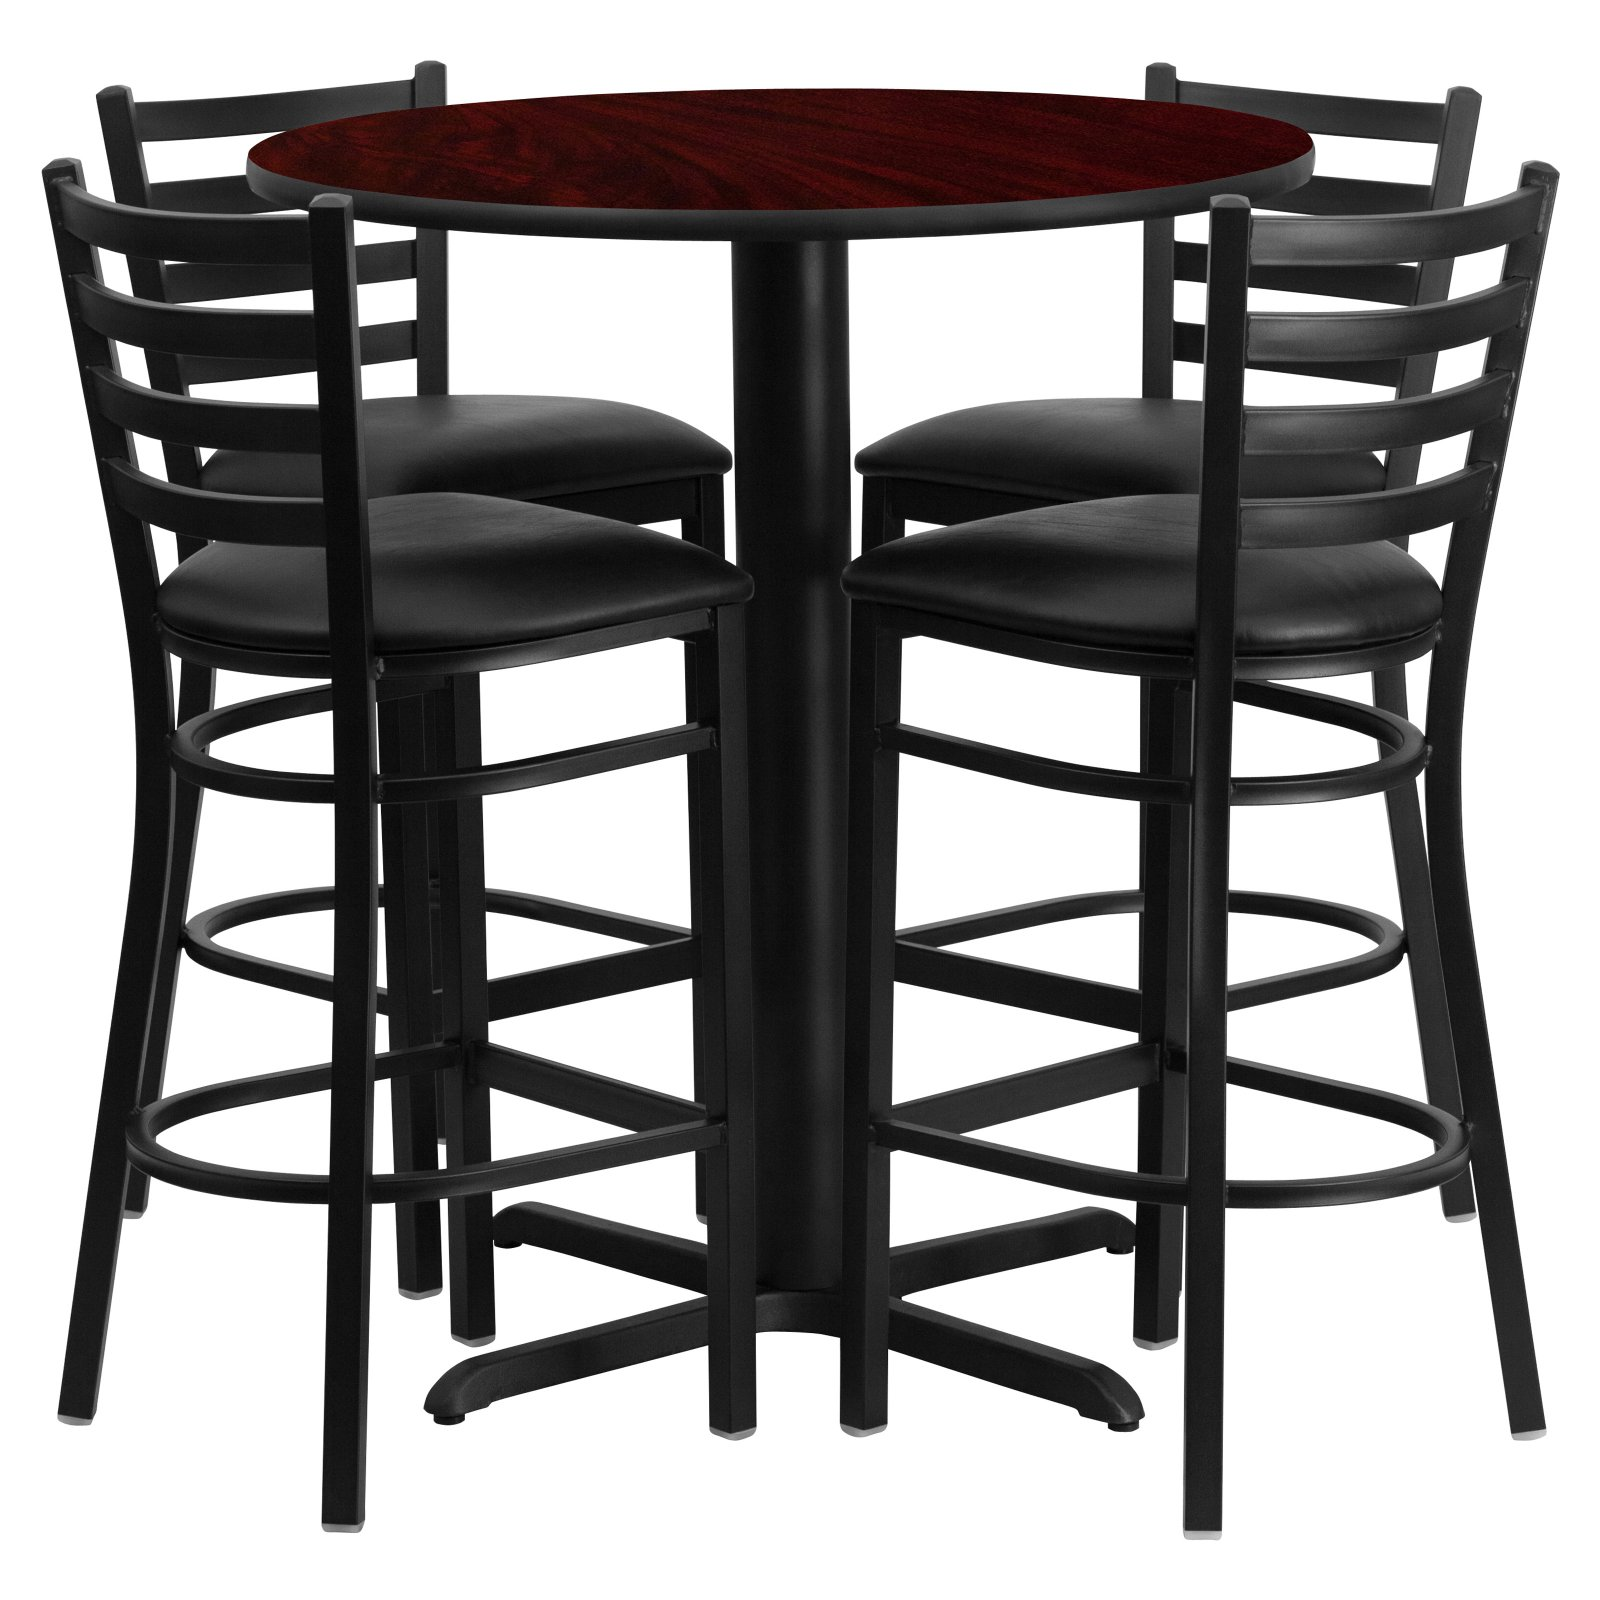 Flash Furniture 30'' Round Mahogany Laminate Table Set with 4 Ladder Back Metal Barstools, Black Vinyl Seat Black, Mahogany